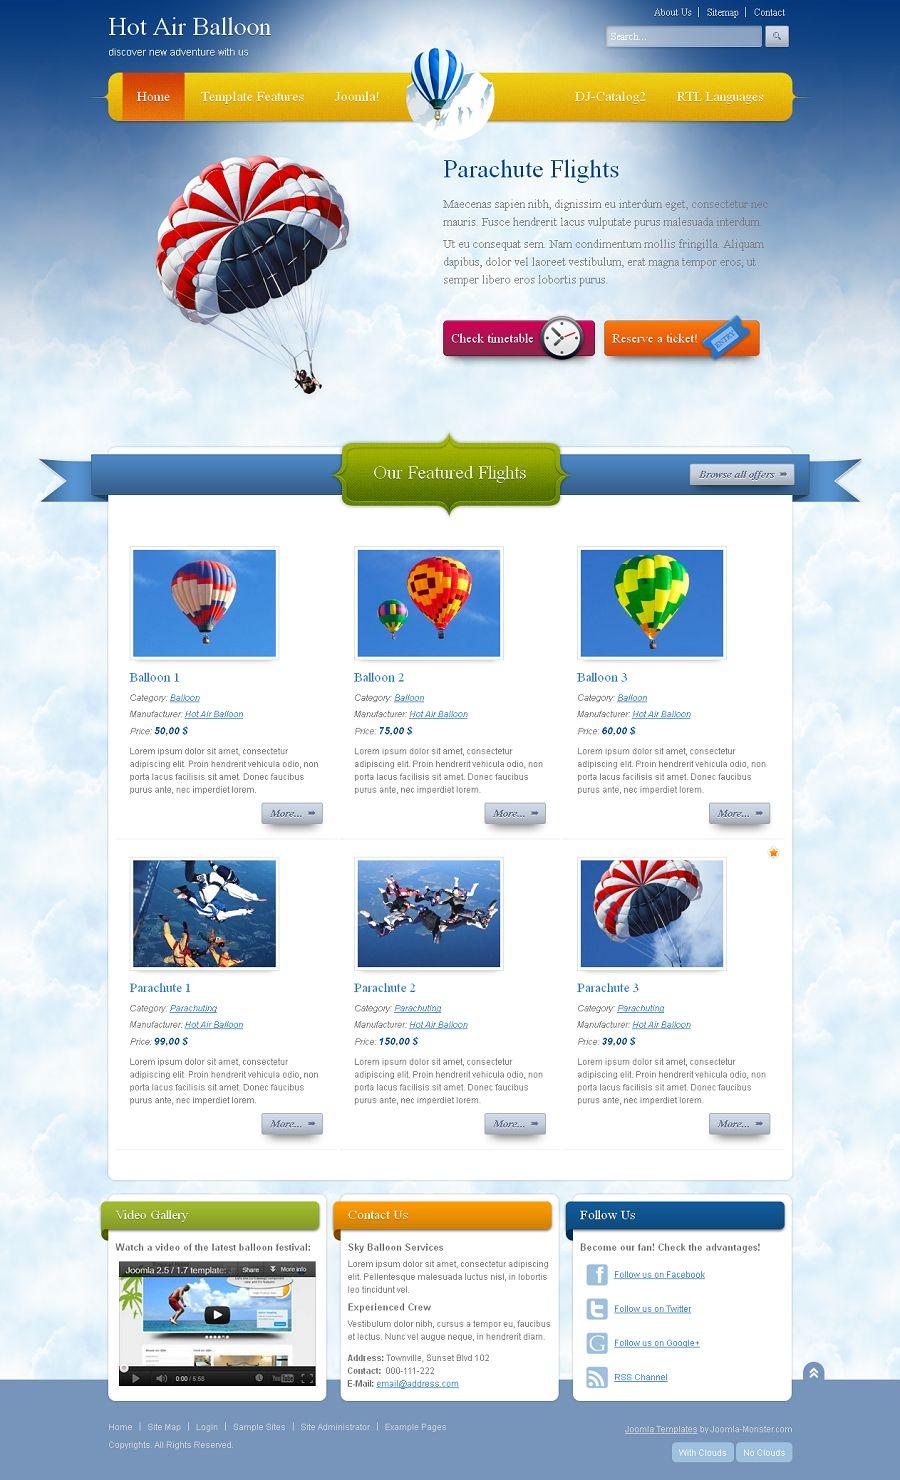 JM-Balloon - Premium Joomla Template for Travel, Adventure